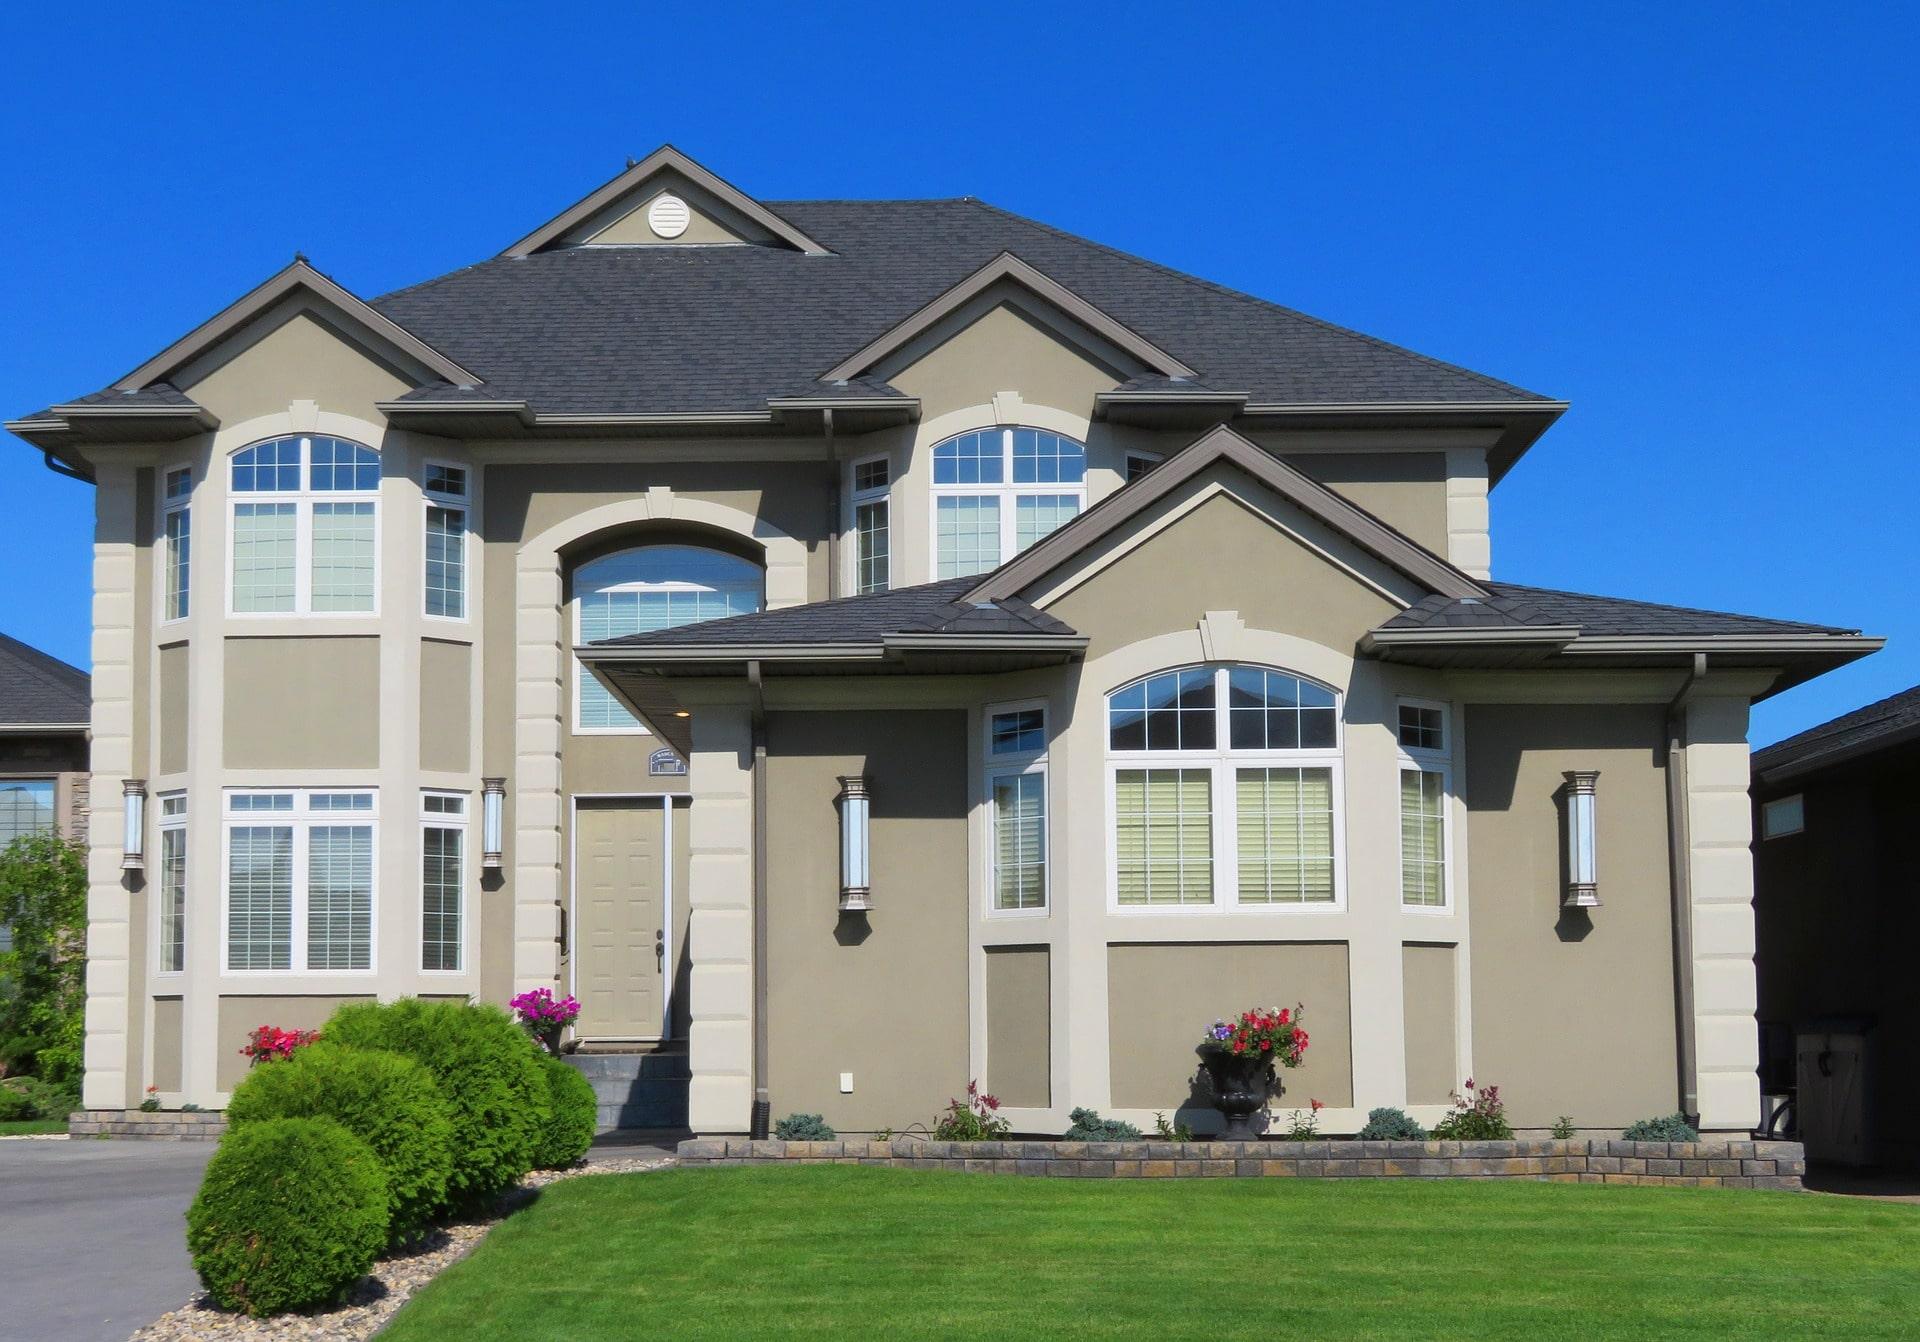 Gray Luxury House Exterior - SolVibrations